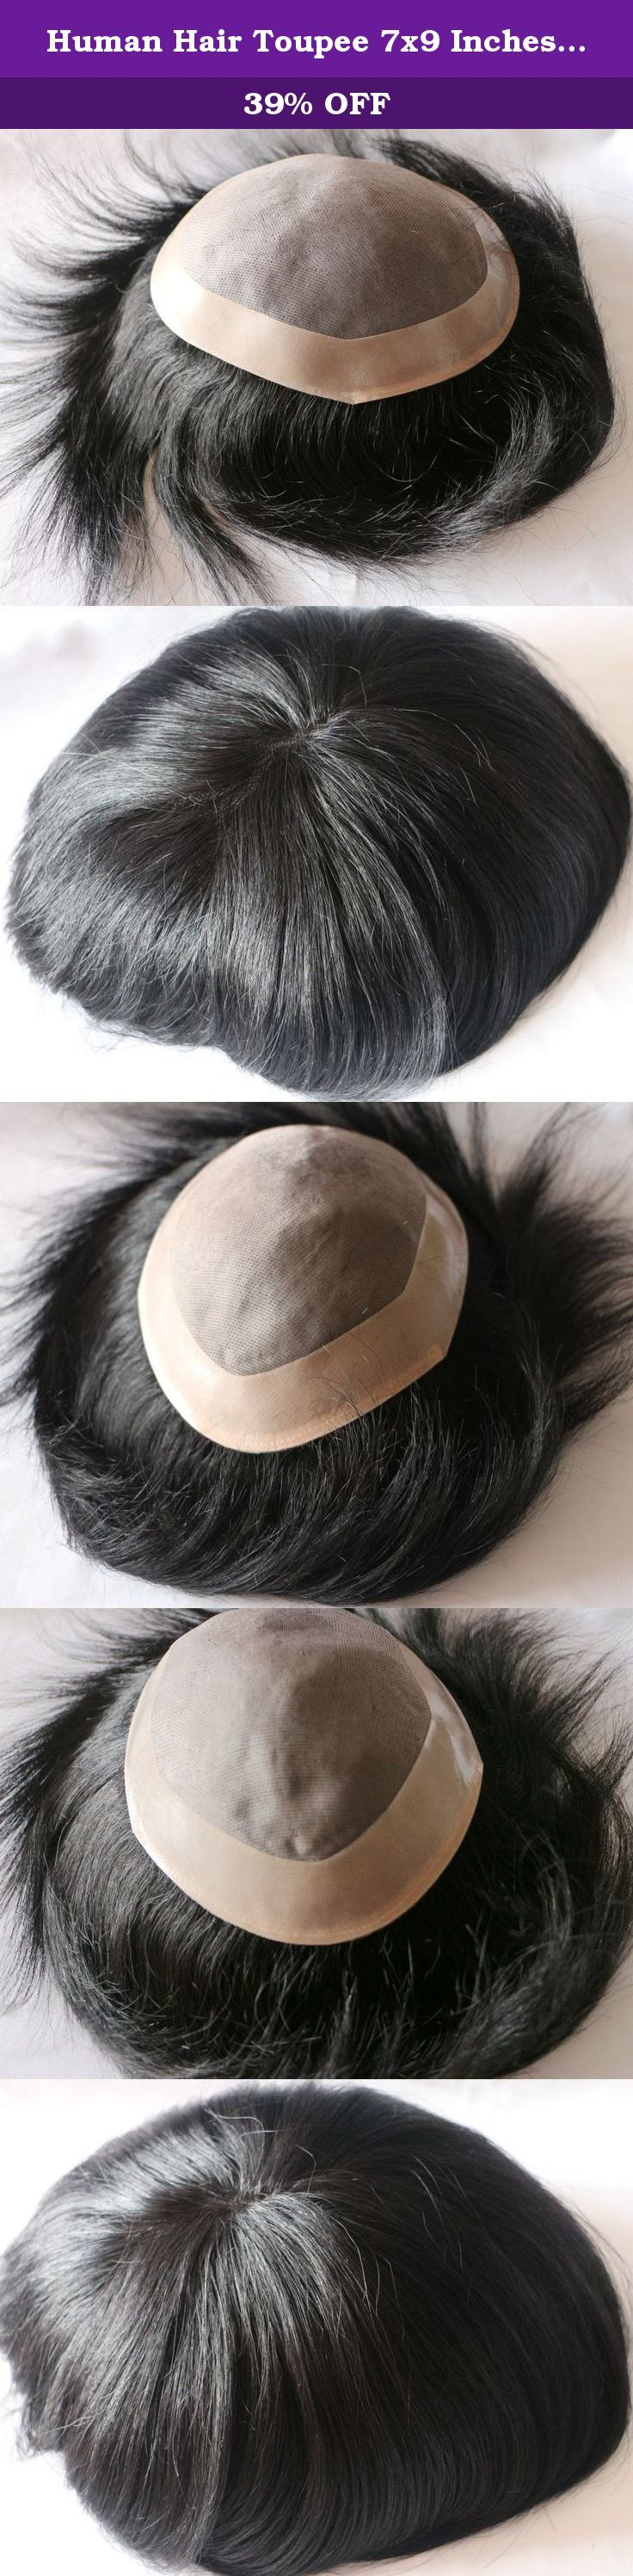 Astonishing 1000 Ide Tentang Hair Toupee Di Pinterest Sambungan Rambut Short Hairstyles Gunalazisus